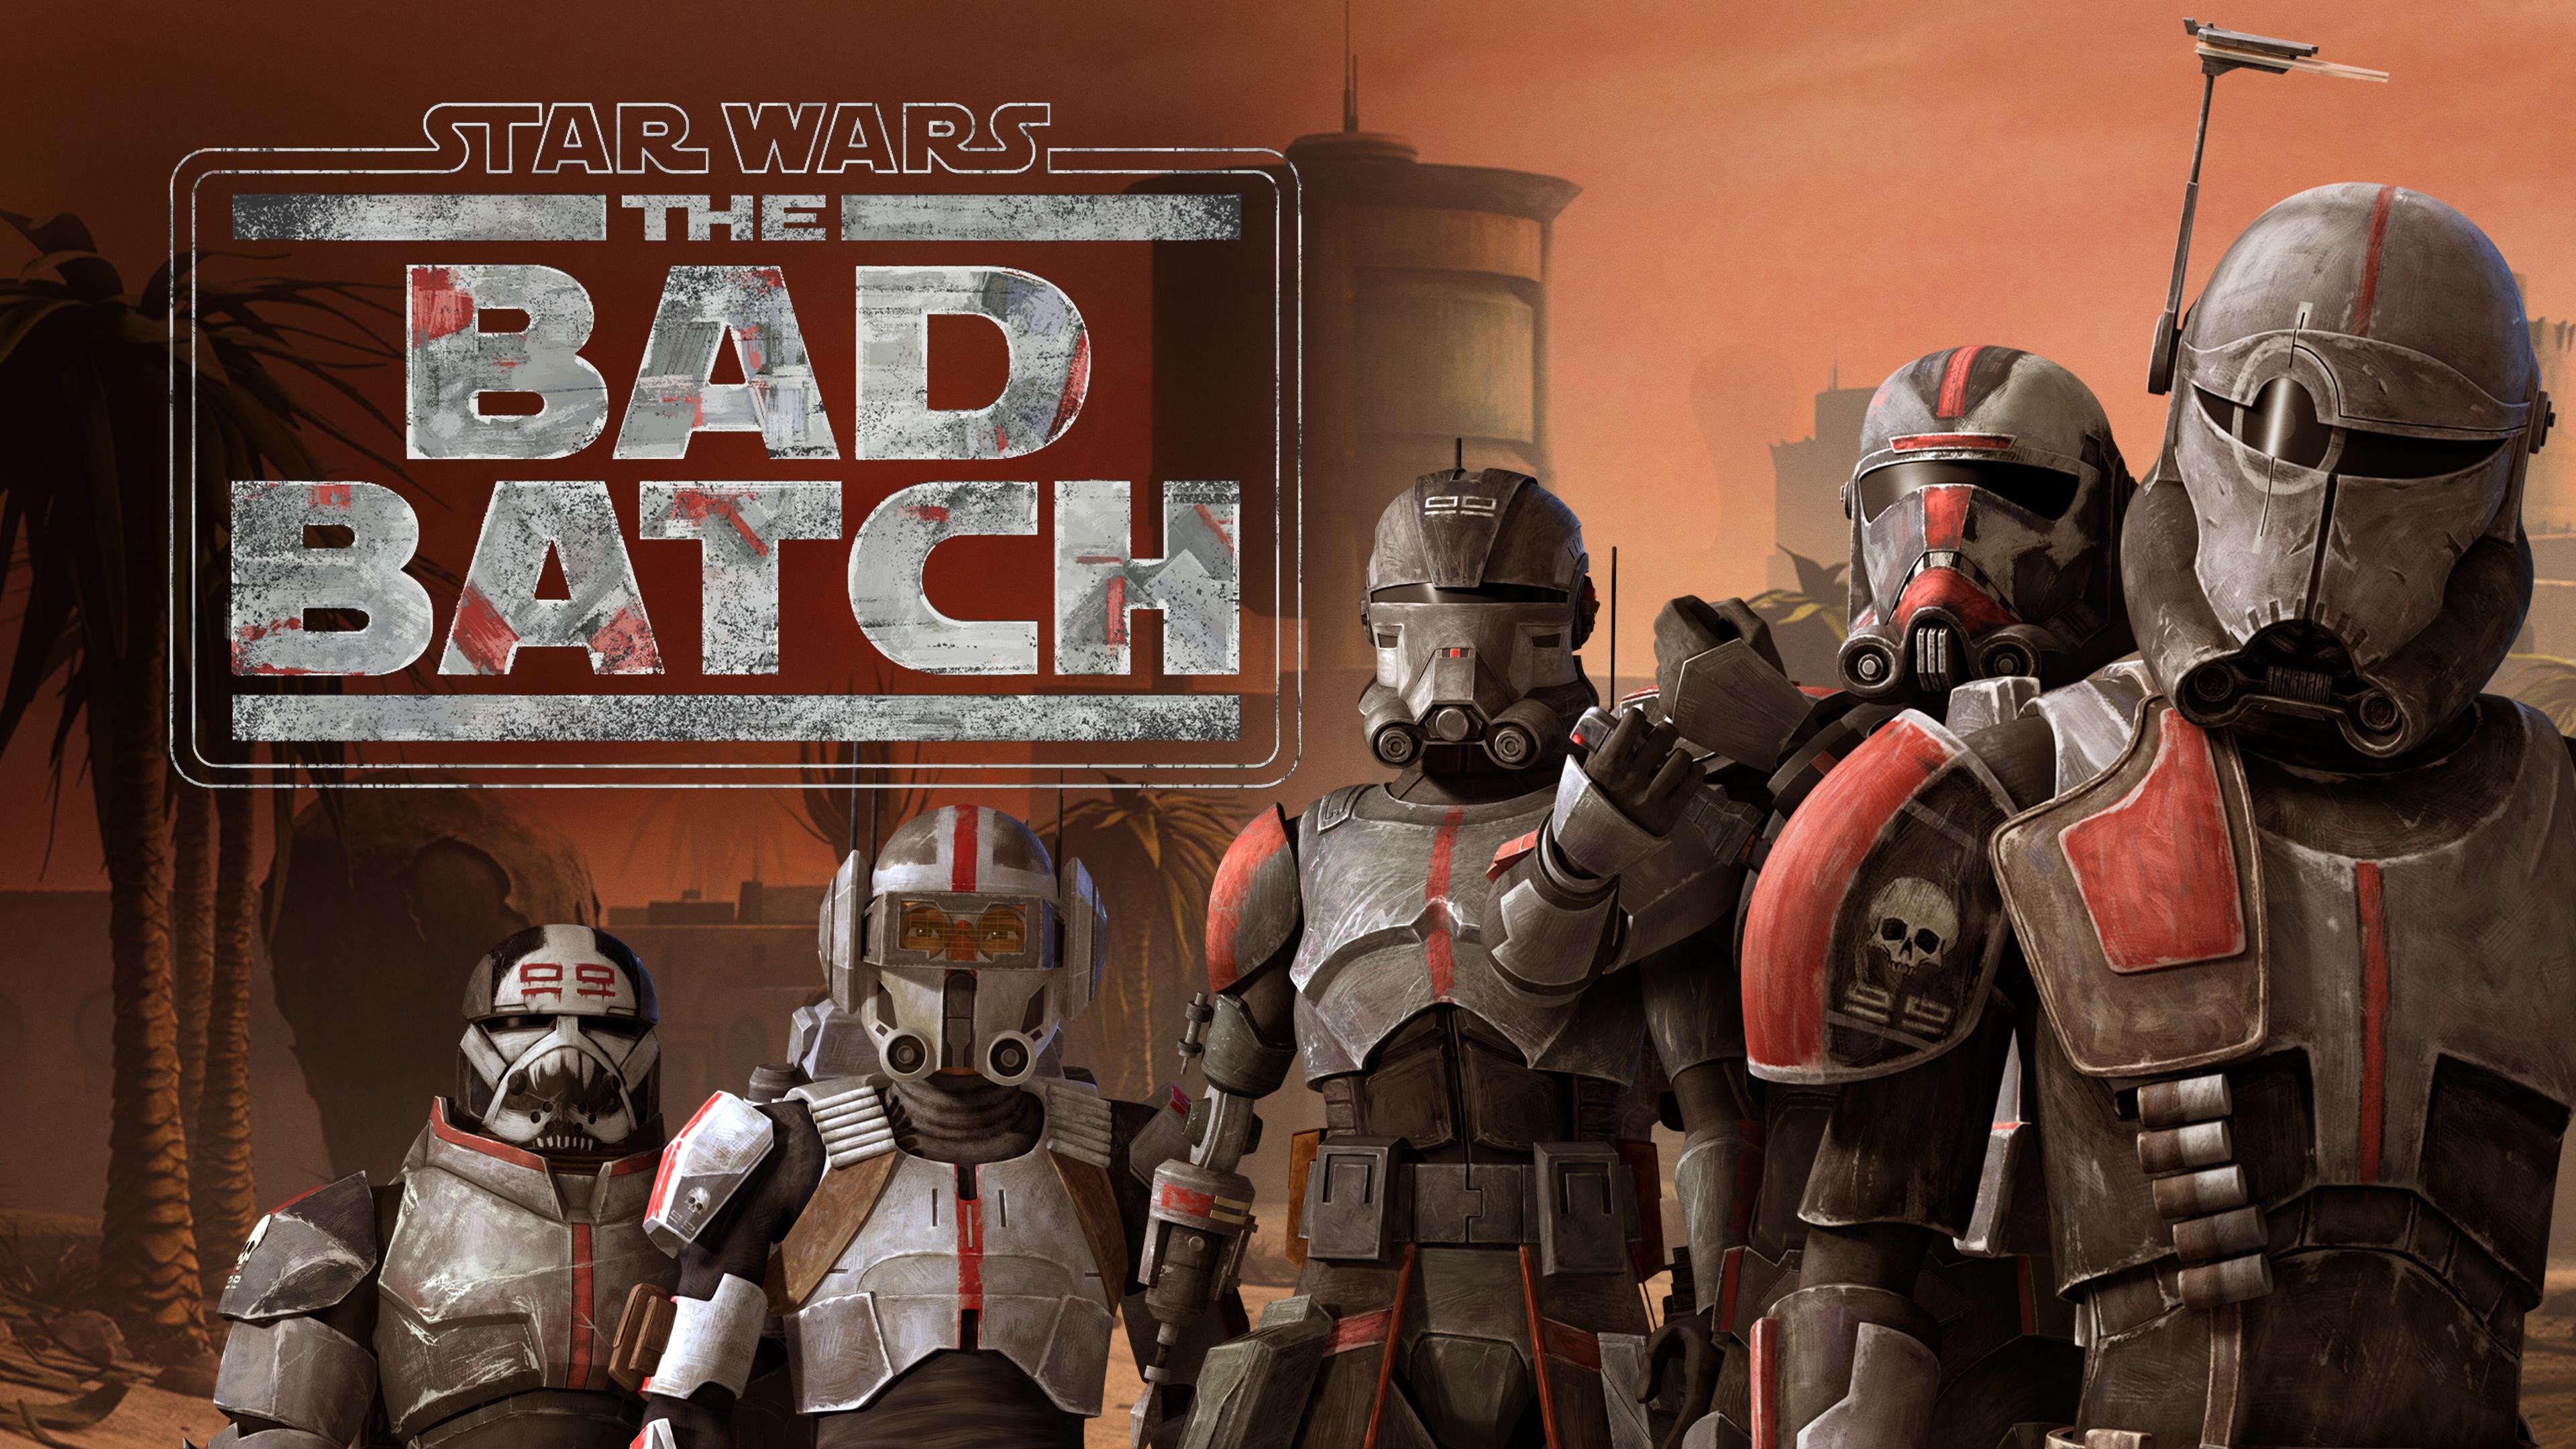 Star Wars Bad Batch Star Wars Bad Batch Clone Trooper TV Series 3840x2160